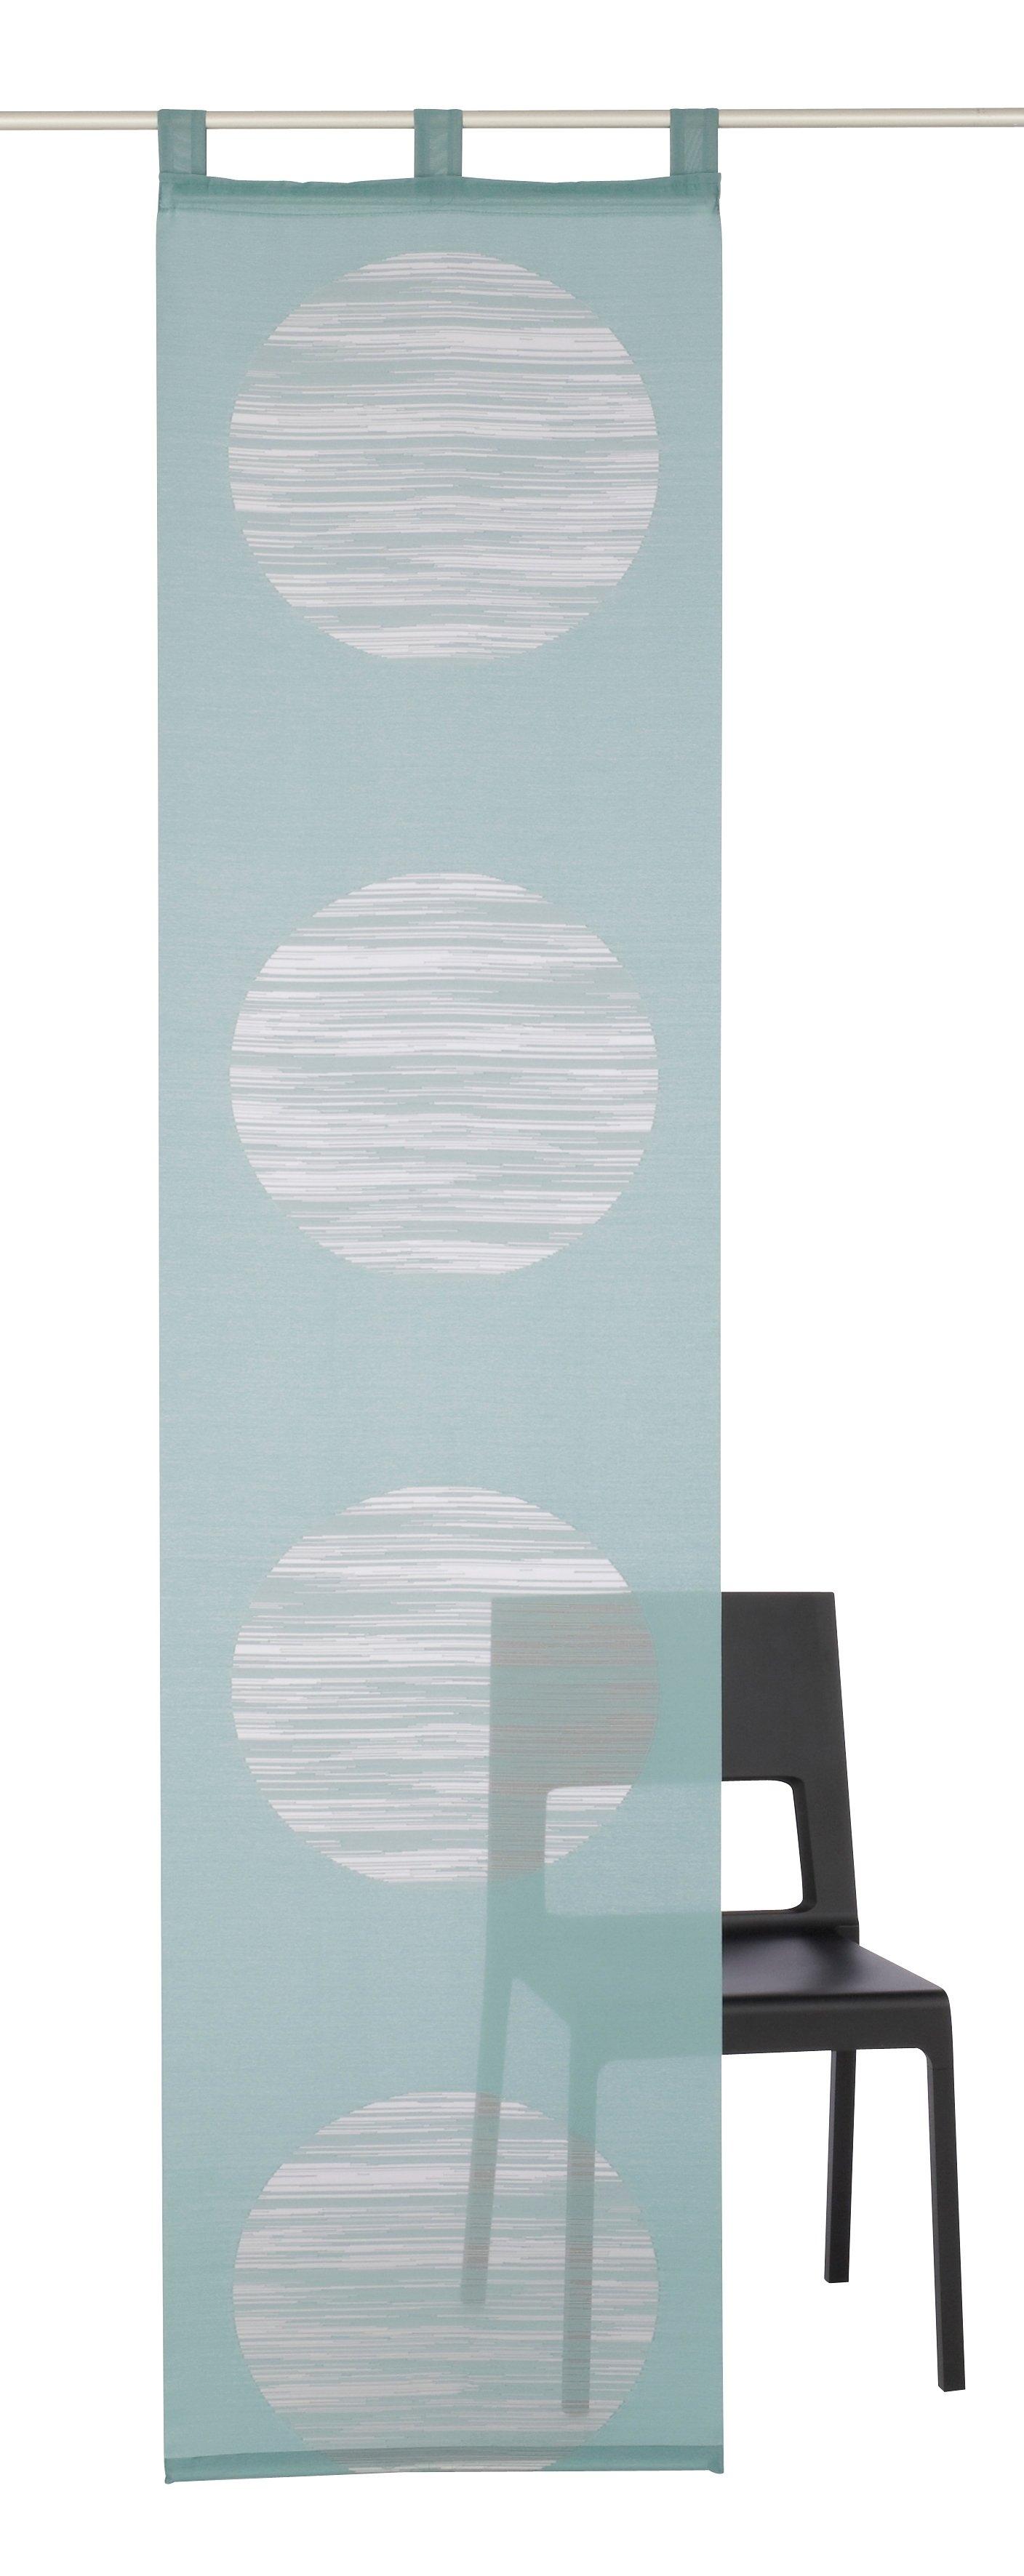 Neutex for you! paneelgordijn Padova Incl. accessoires (1 stuk) - gratis ruilen op otto.nl